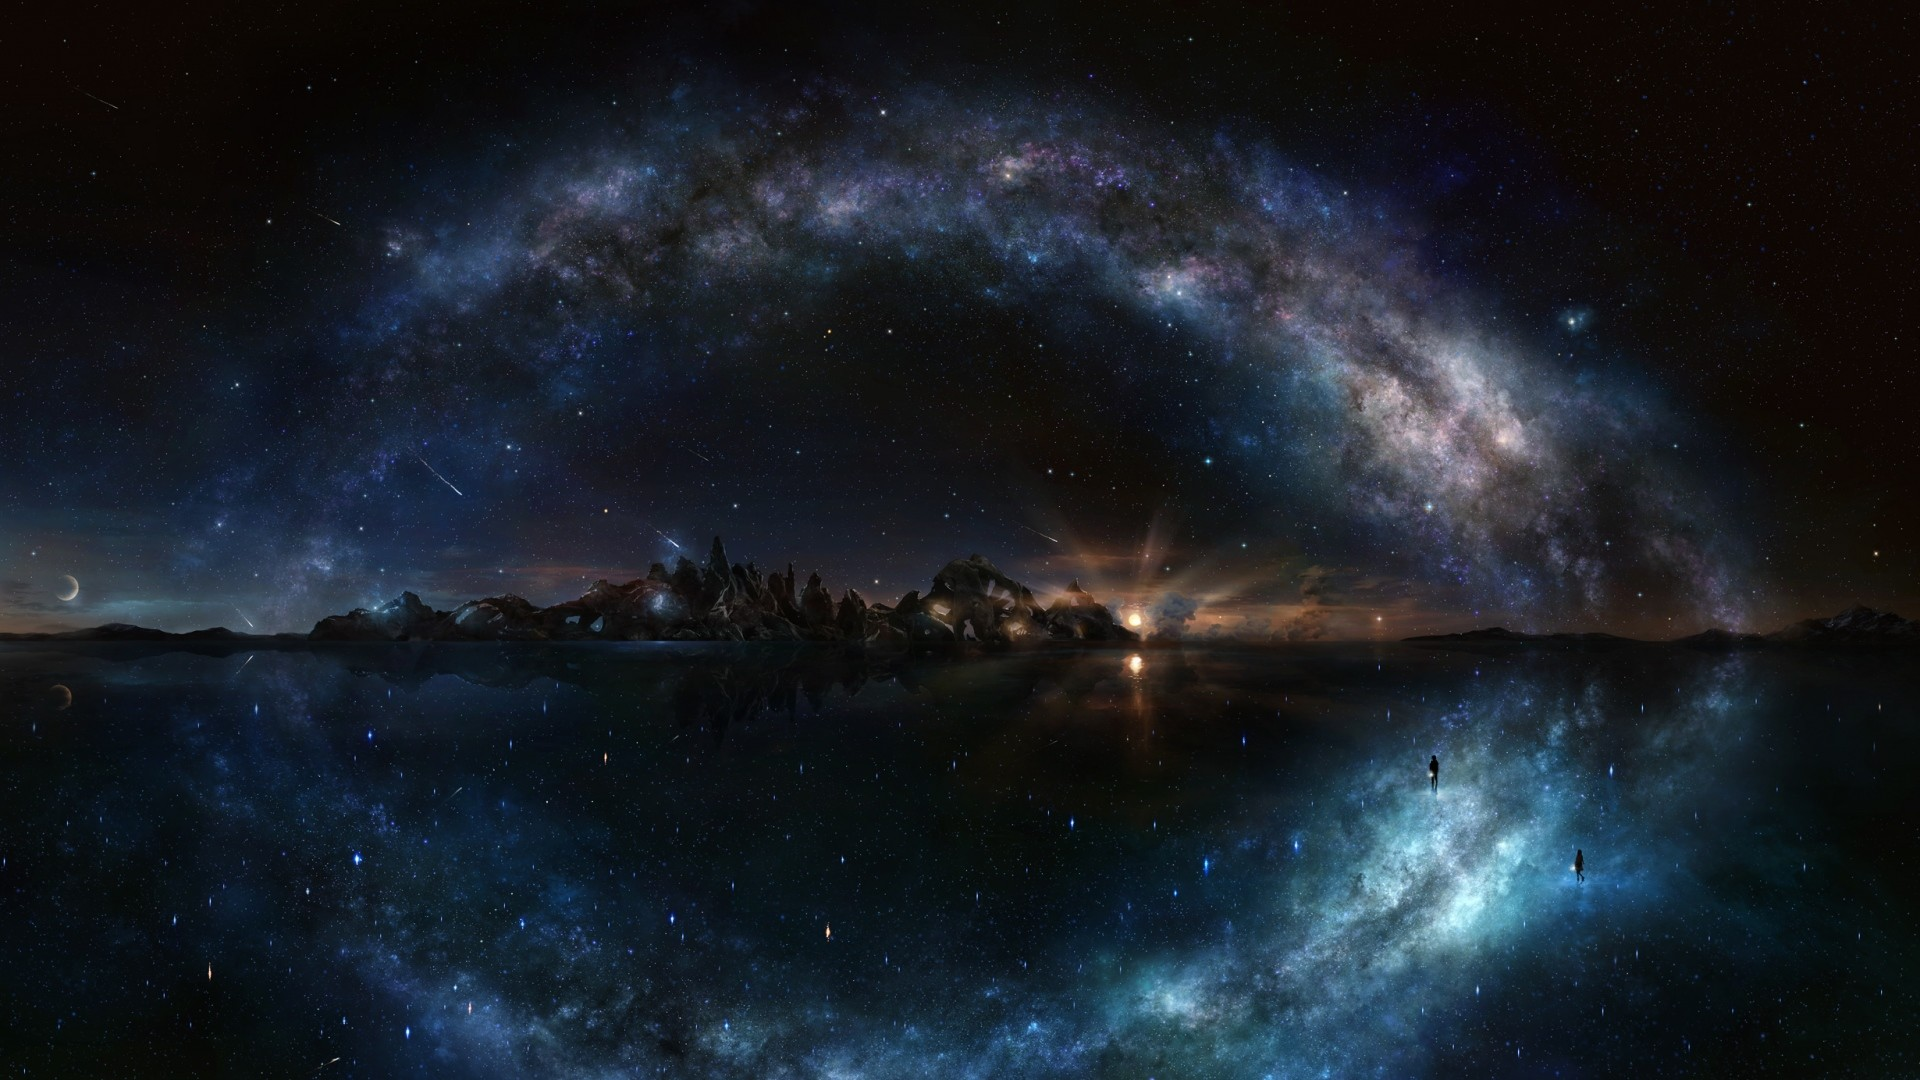 Wallpaper night, starry sky, shine, water, island, rock, galaxy